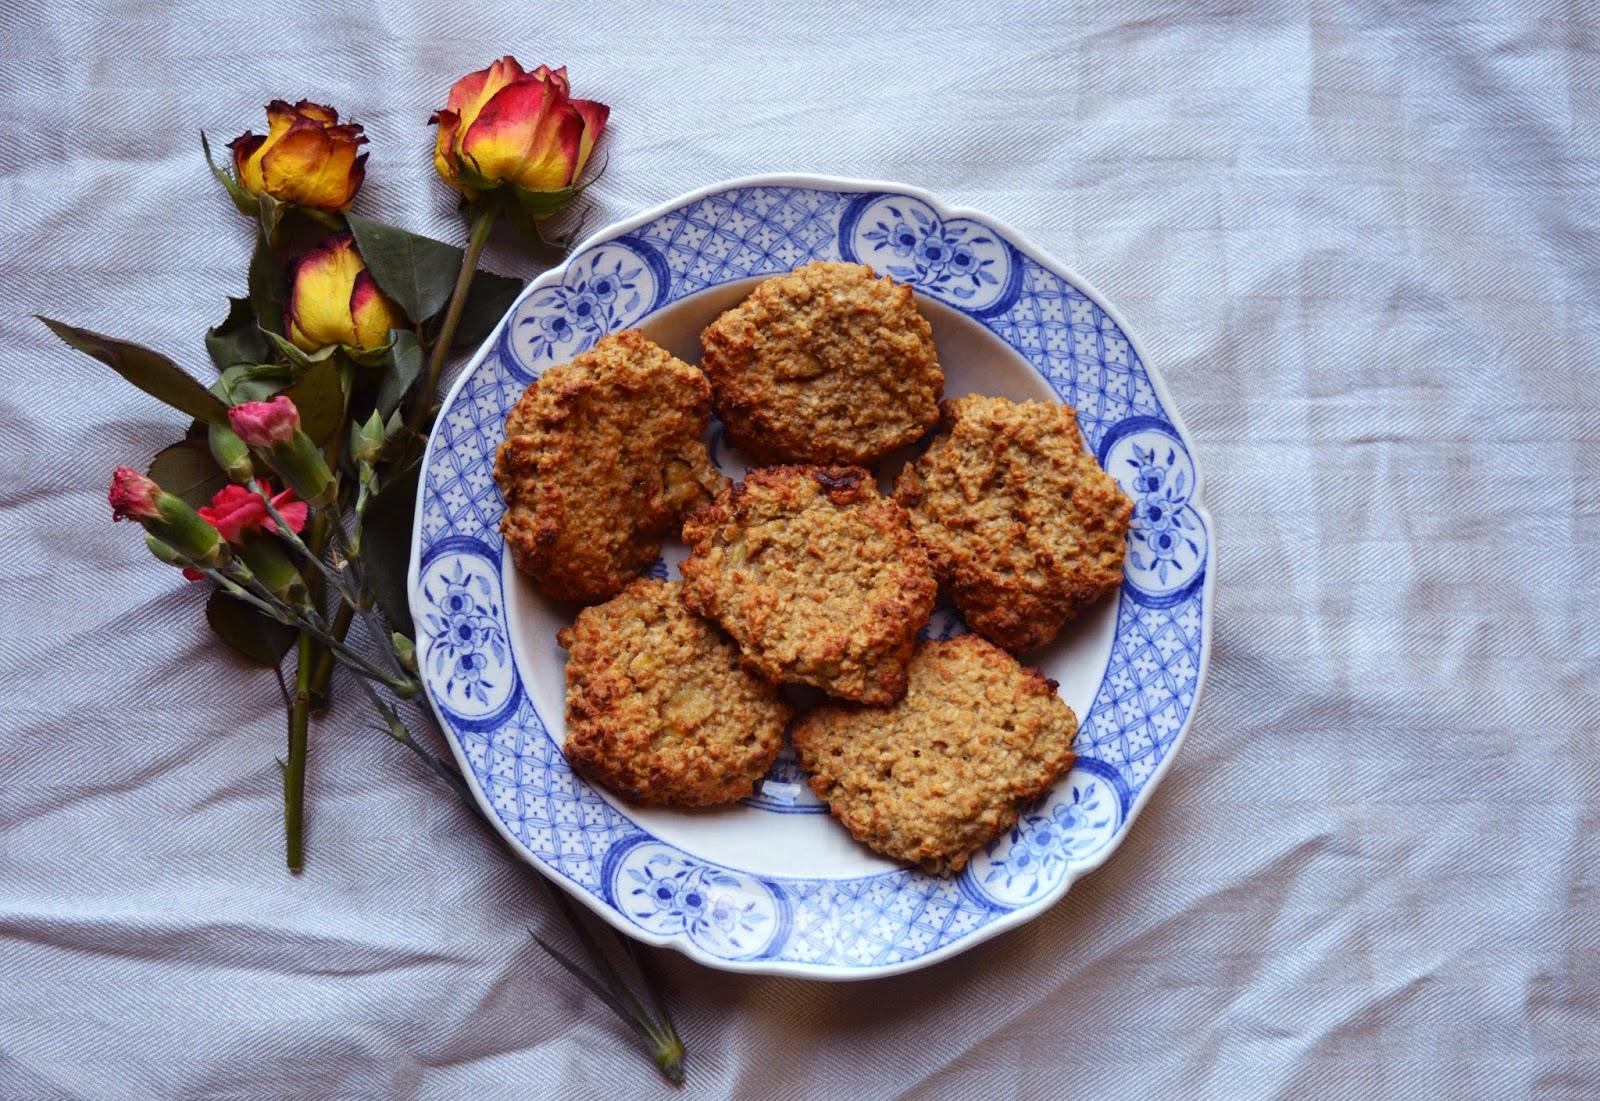 easy%2Bbanana%2Boatmeal%2Bcookies%2B3.jpg